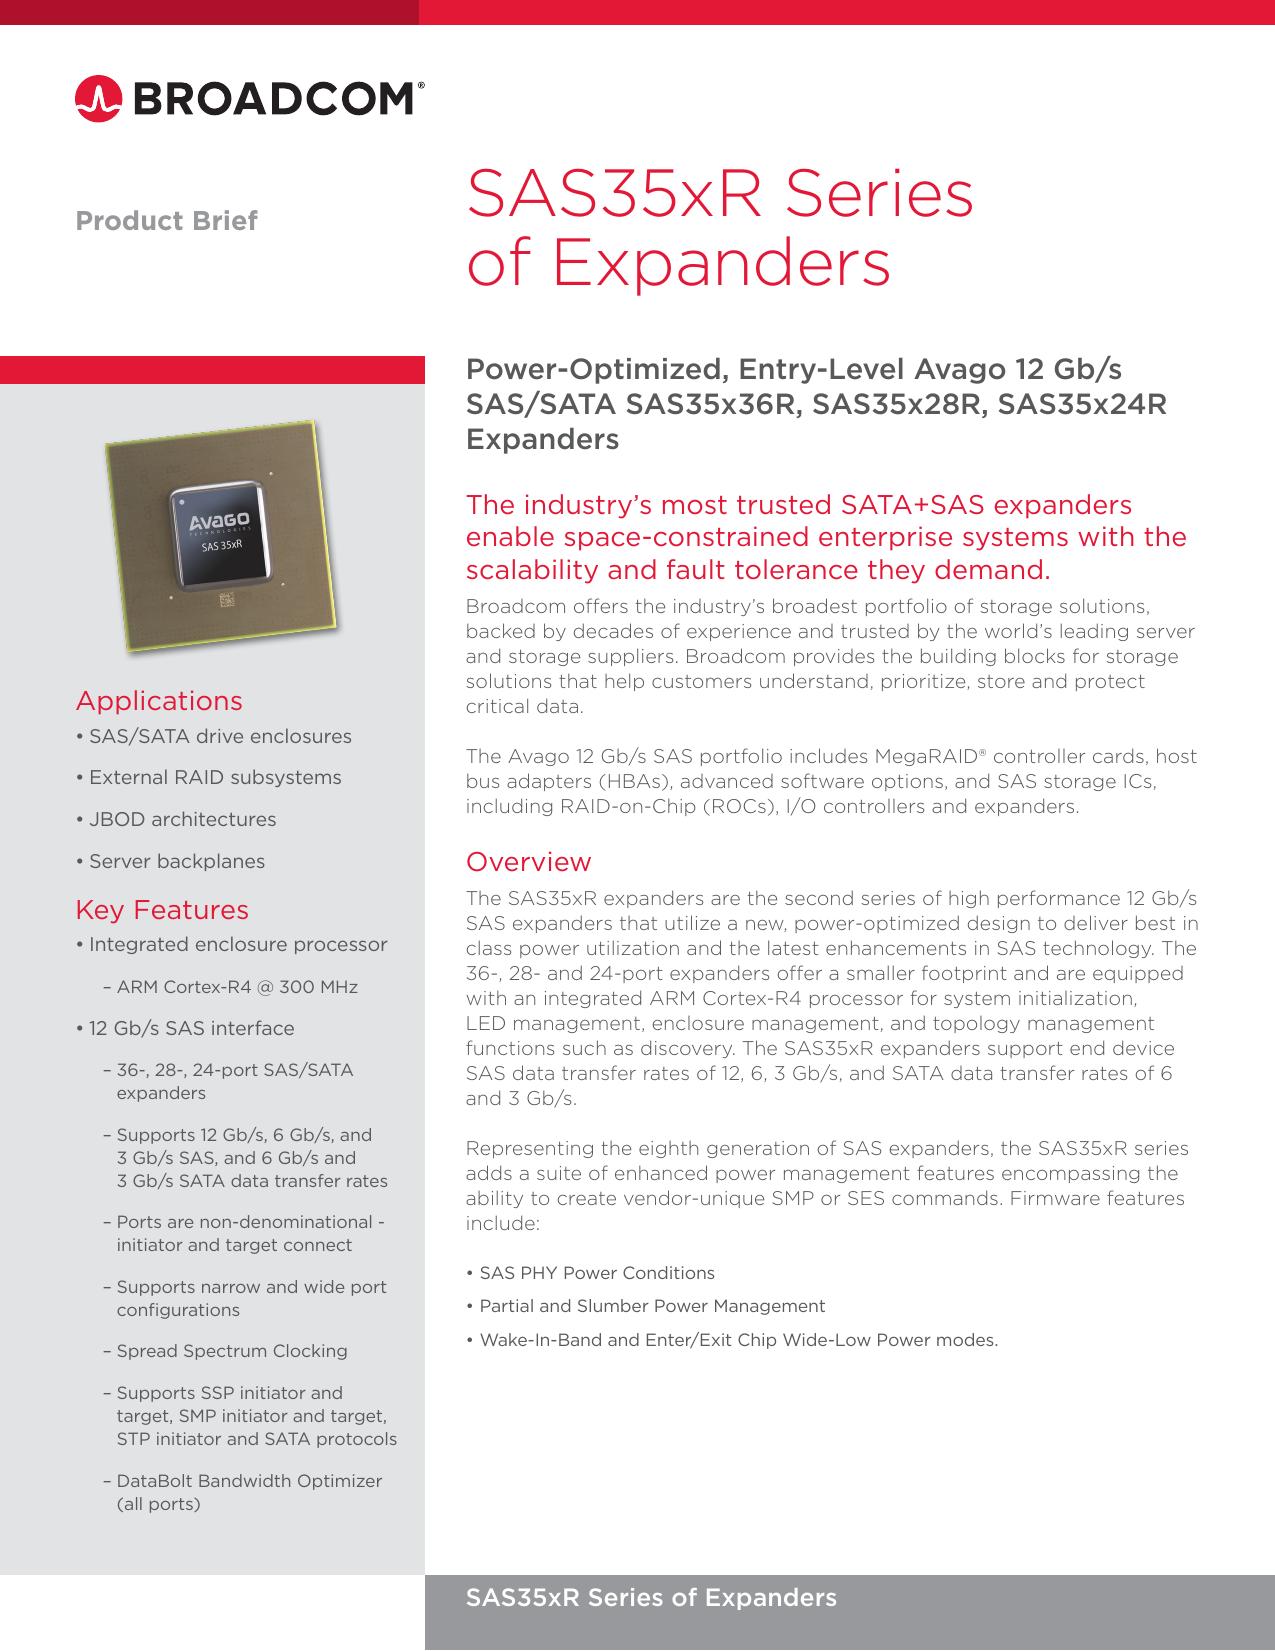 SAS35xR Series of Expanders | manualzz com